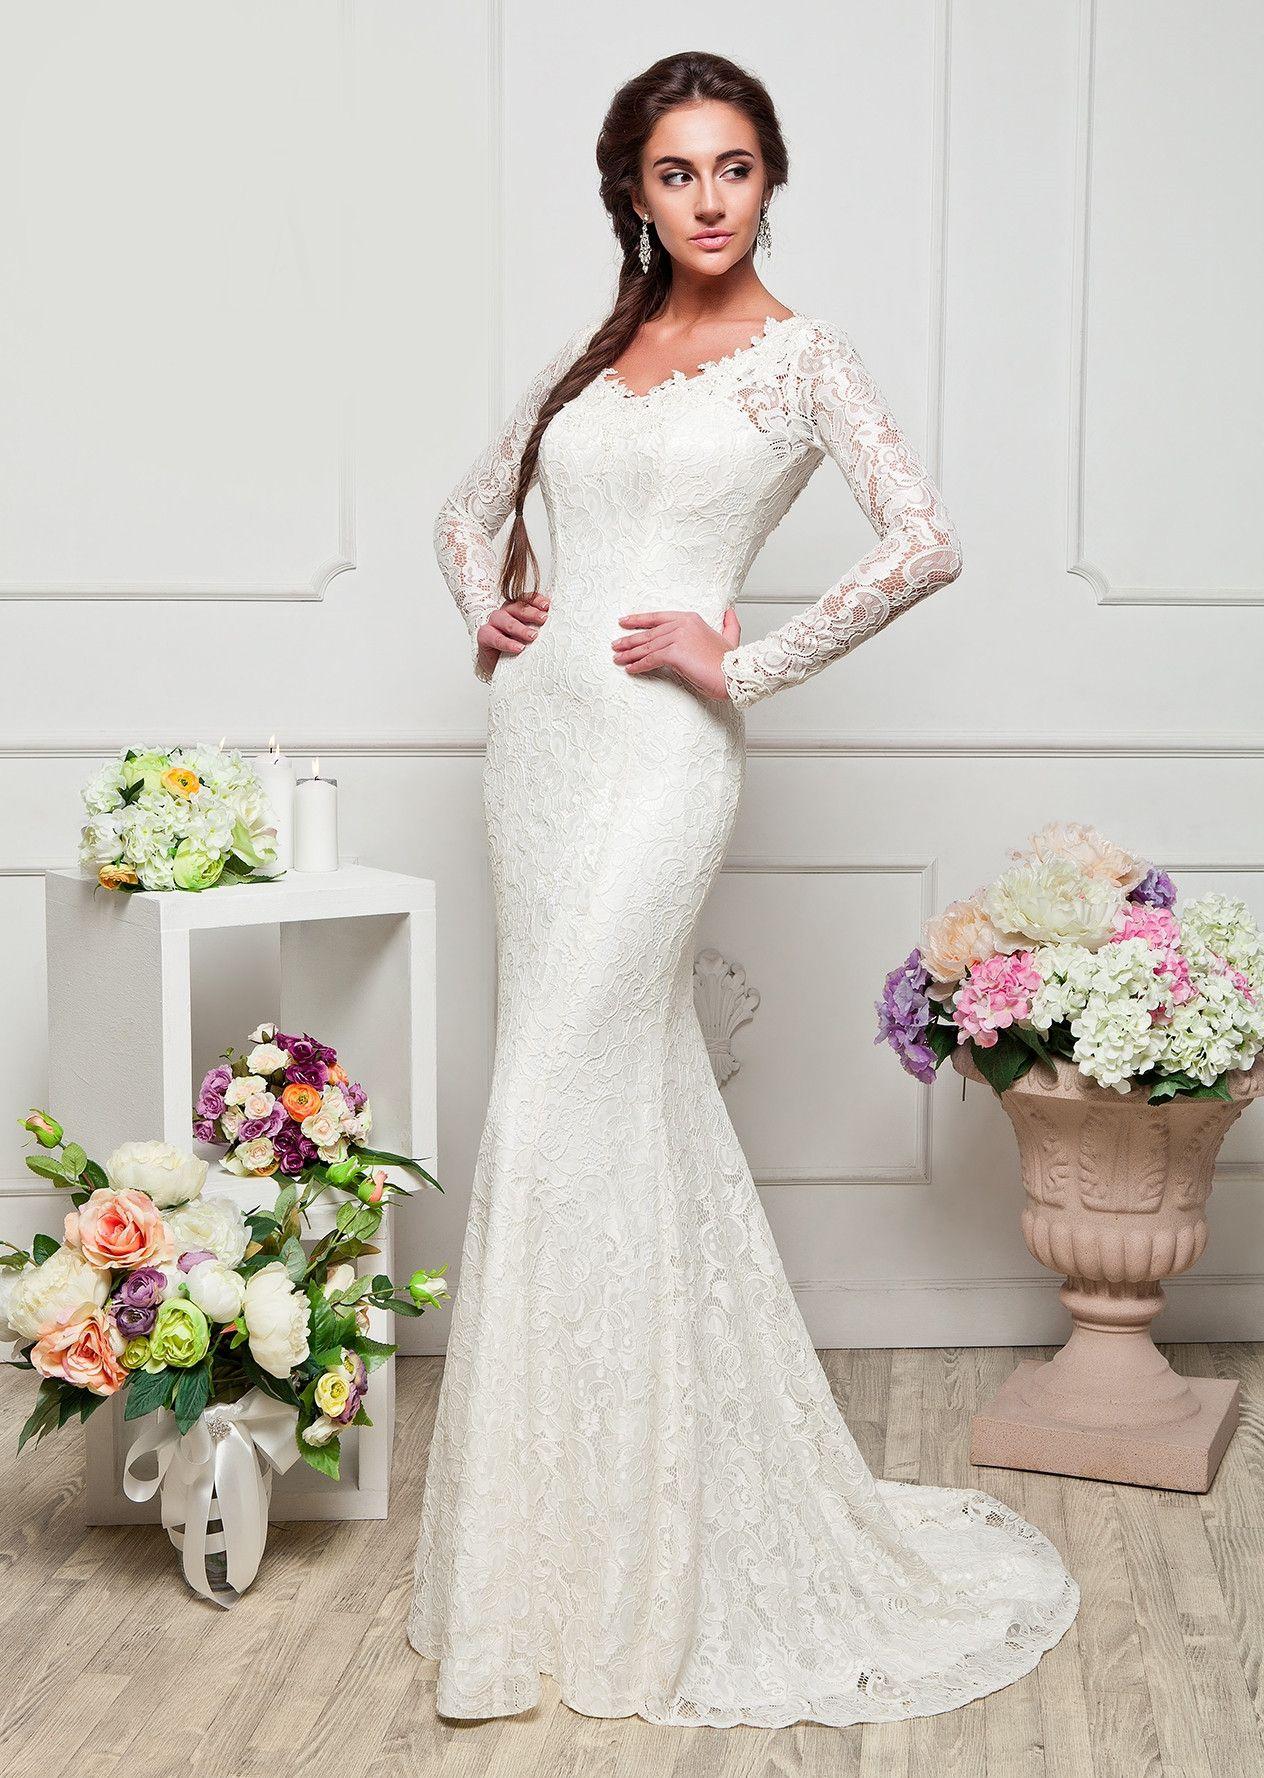 Anasta long lace wedding dress wedding ideas pinterest simple